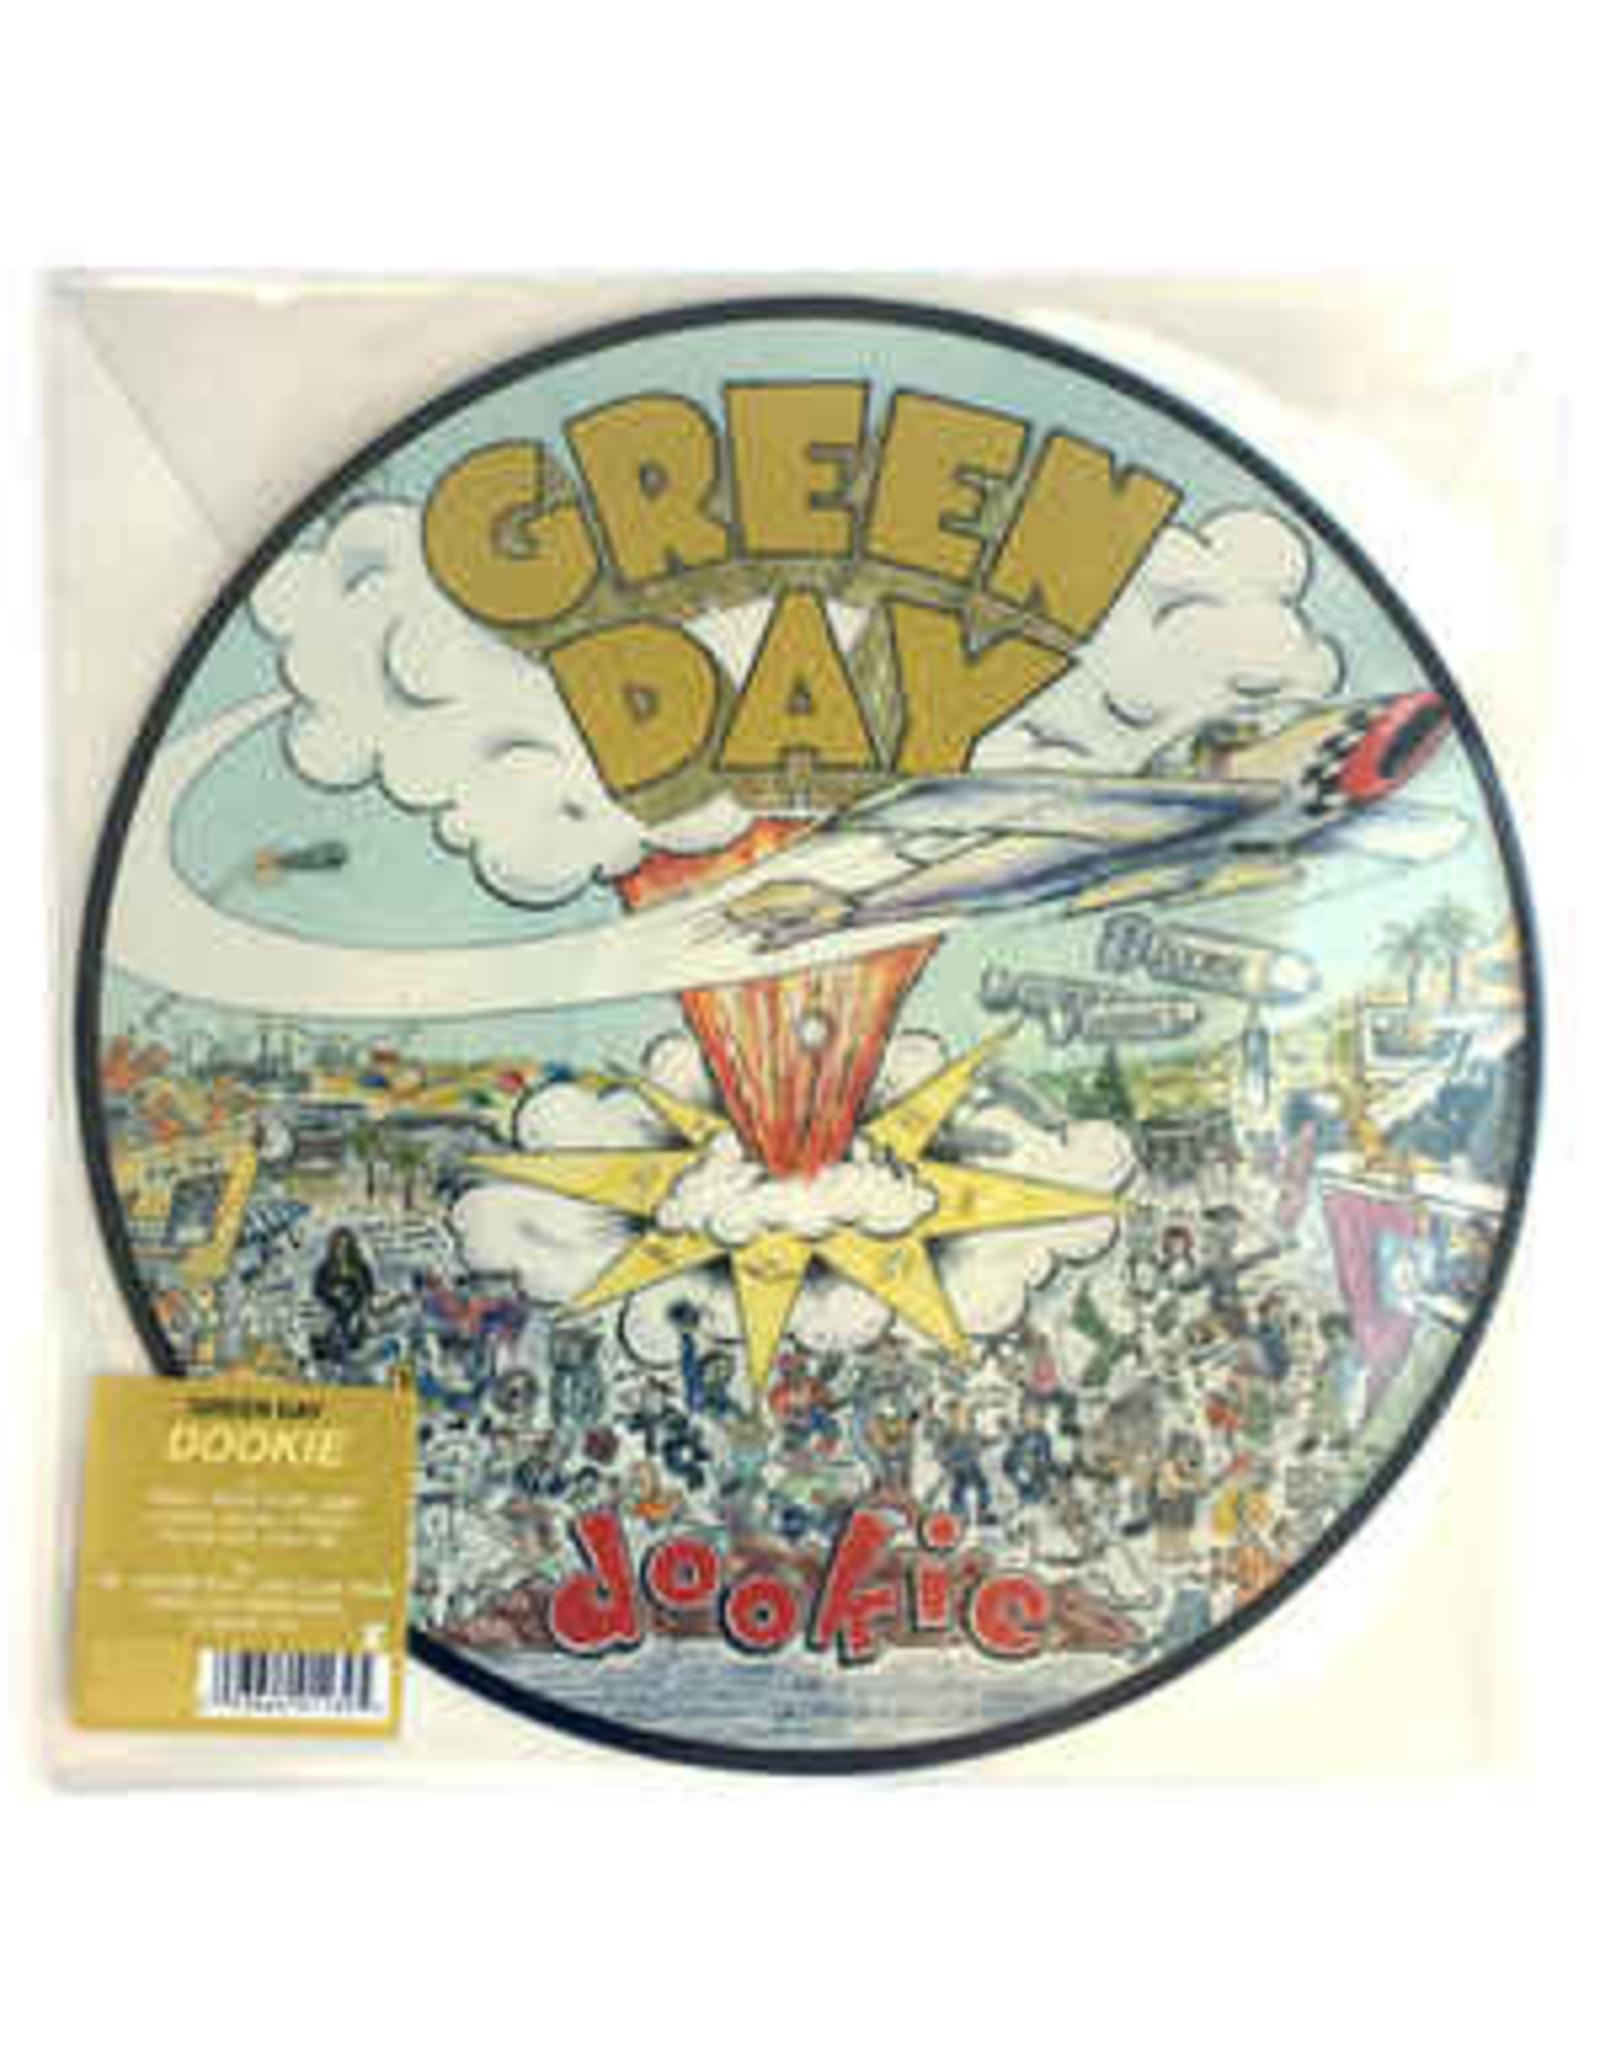 Green Day - Dookie PicDisc LP